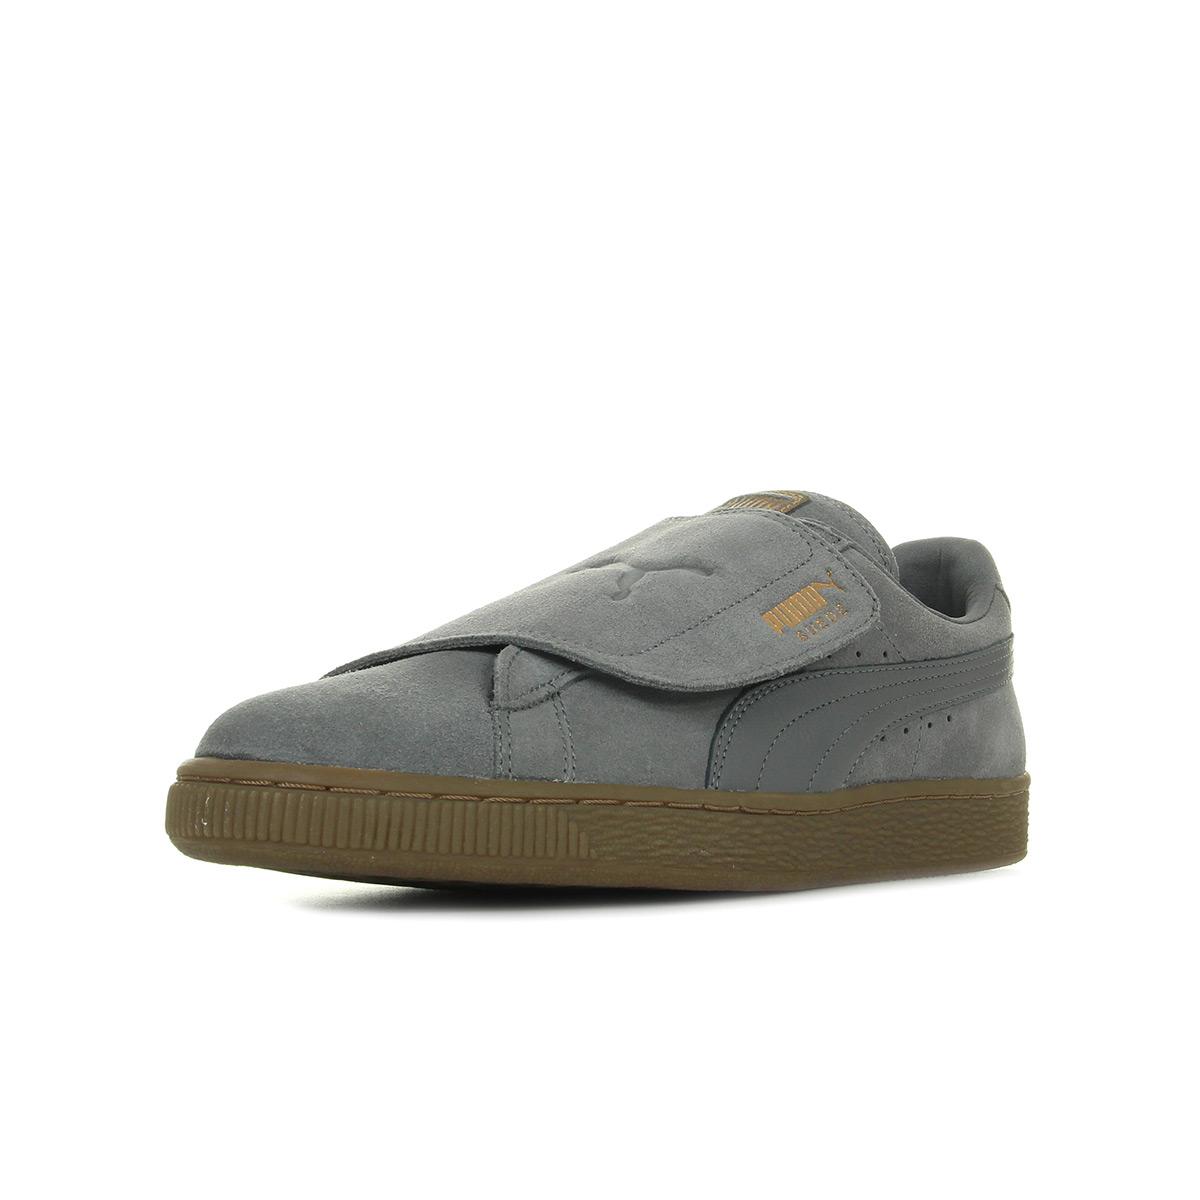 Chaussures Baskets Puma unisexe Suede Wrap Gum Burn taille Gris Grise Cuir